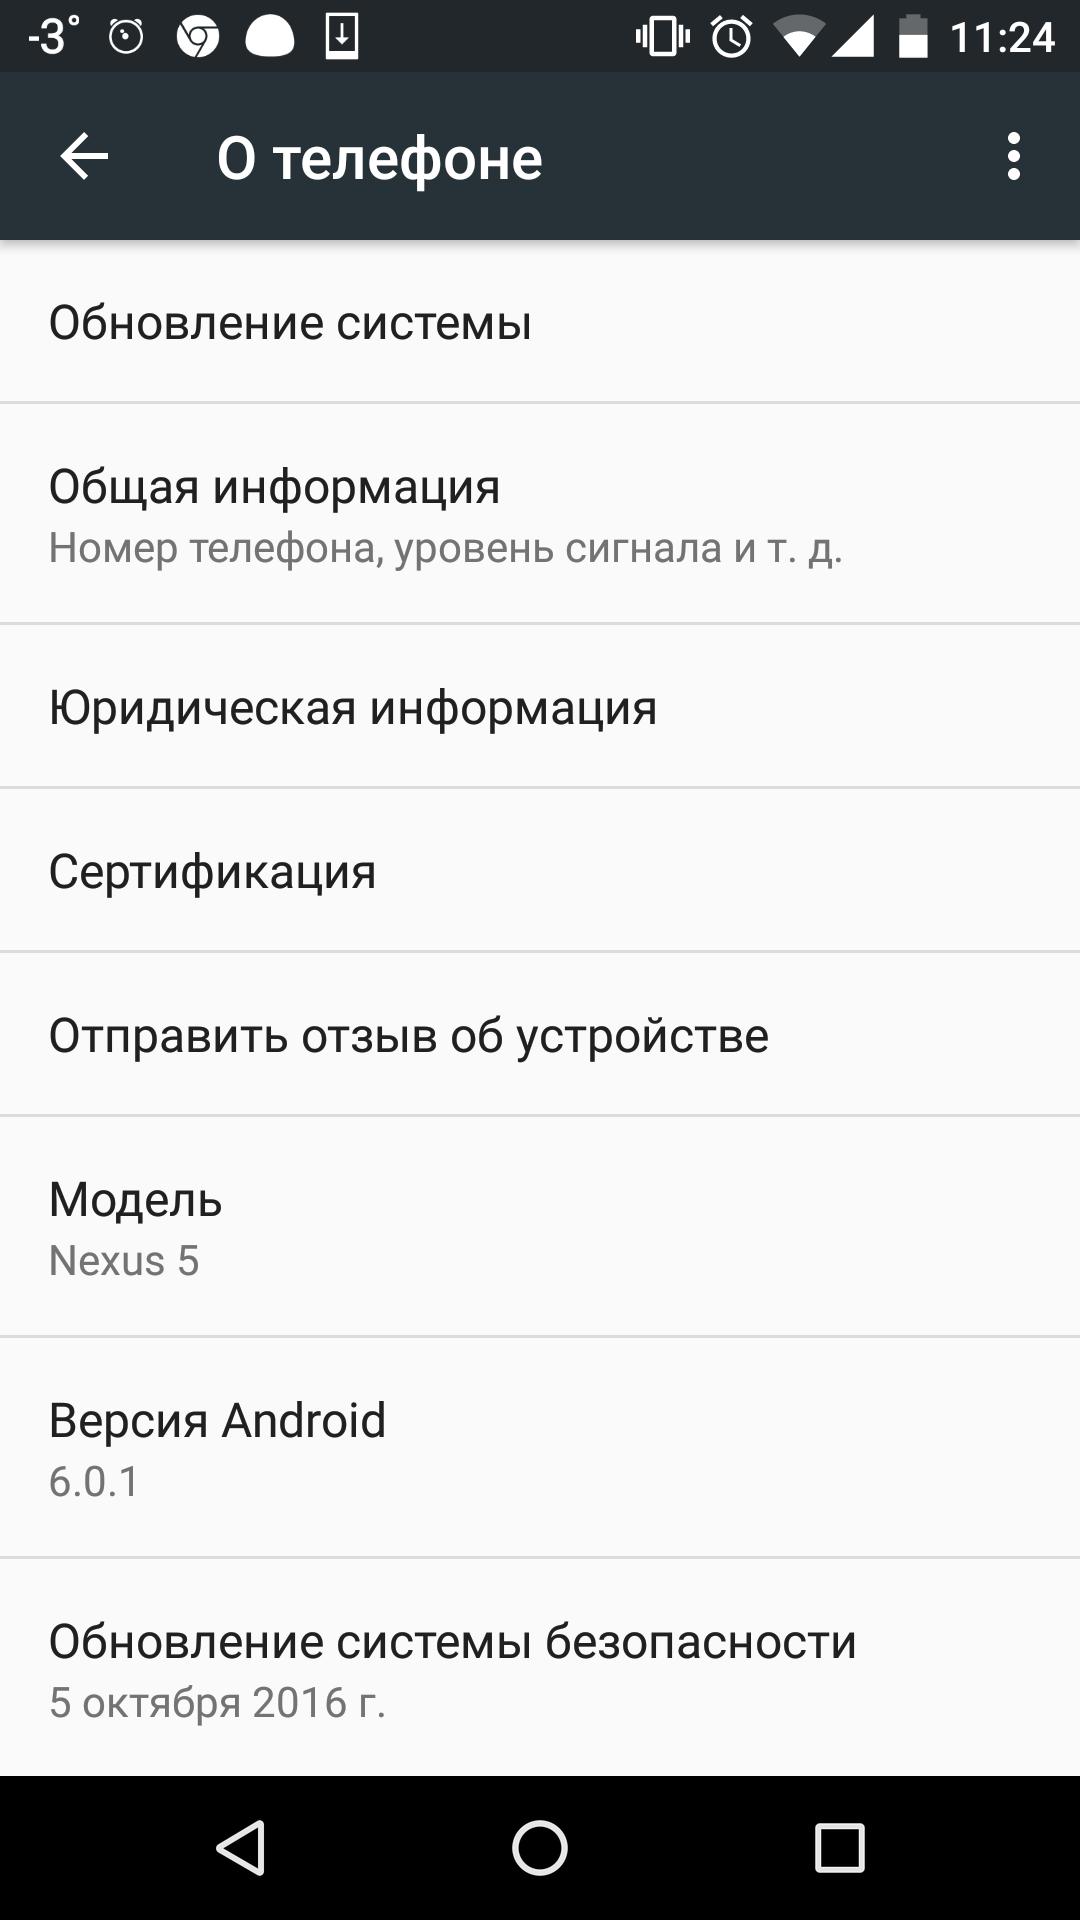 "Приложения для анализа характеристик устройств ""Android"""